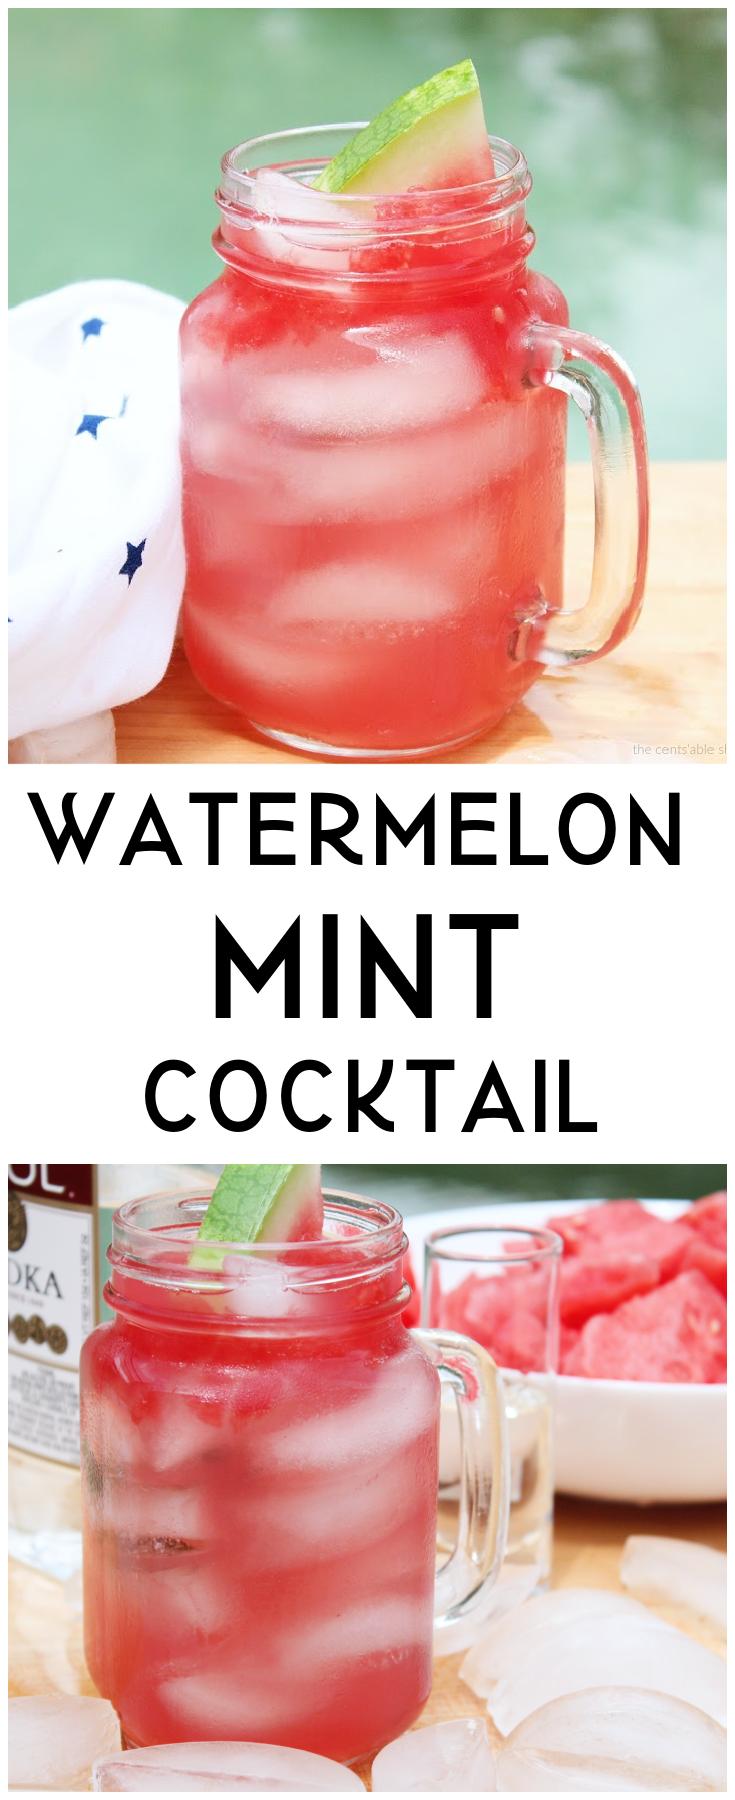 Watermelon Mint Cocktail